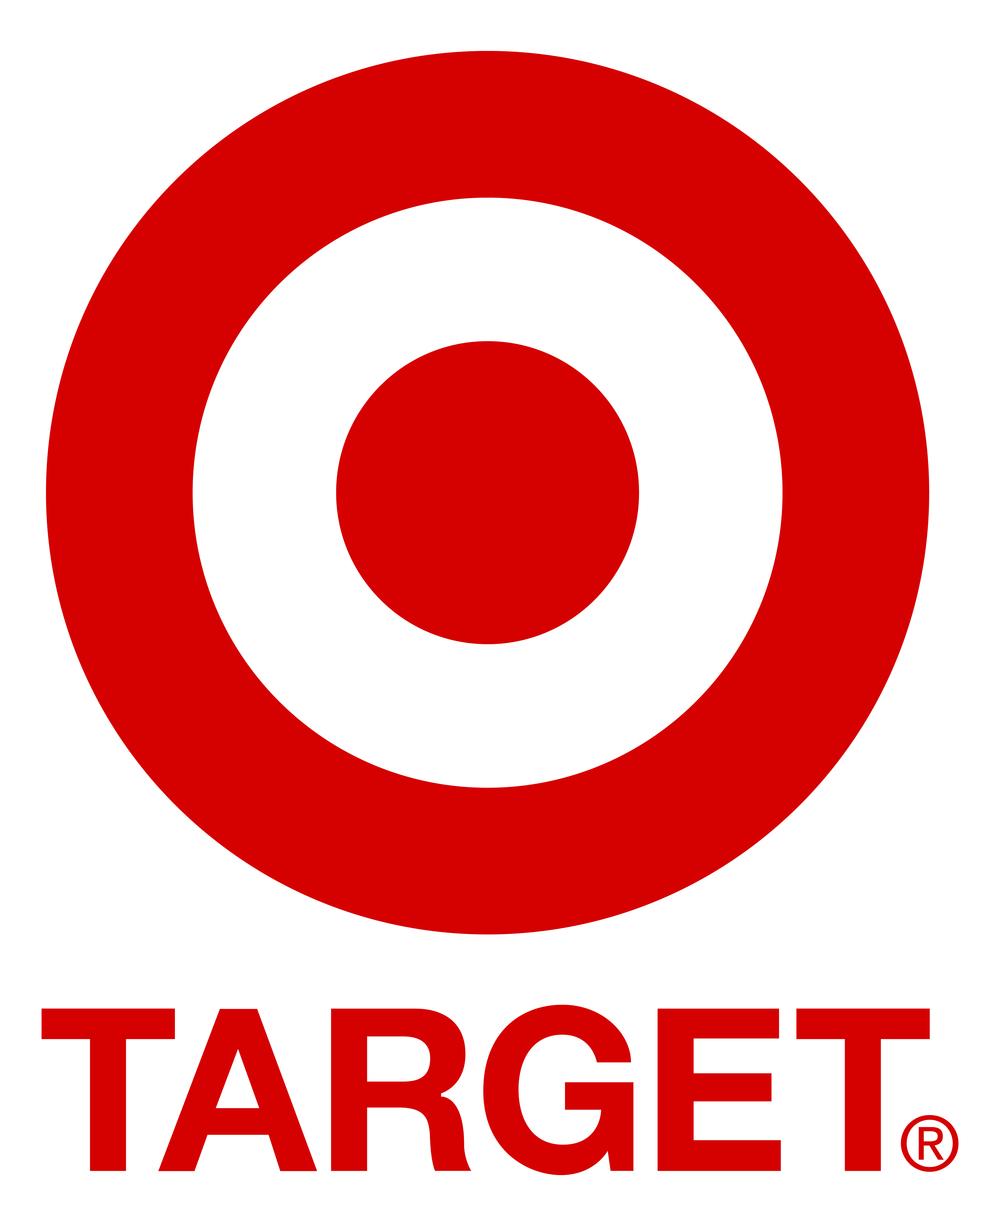 target_qeC.jpg